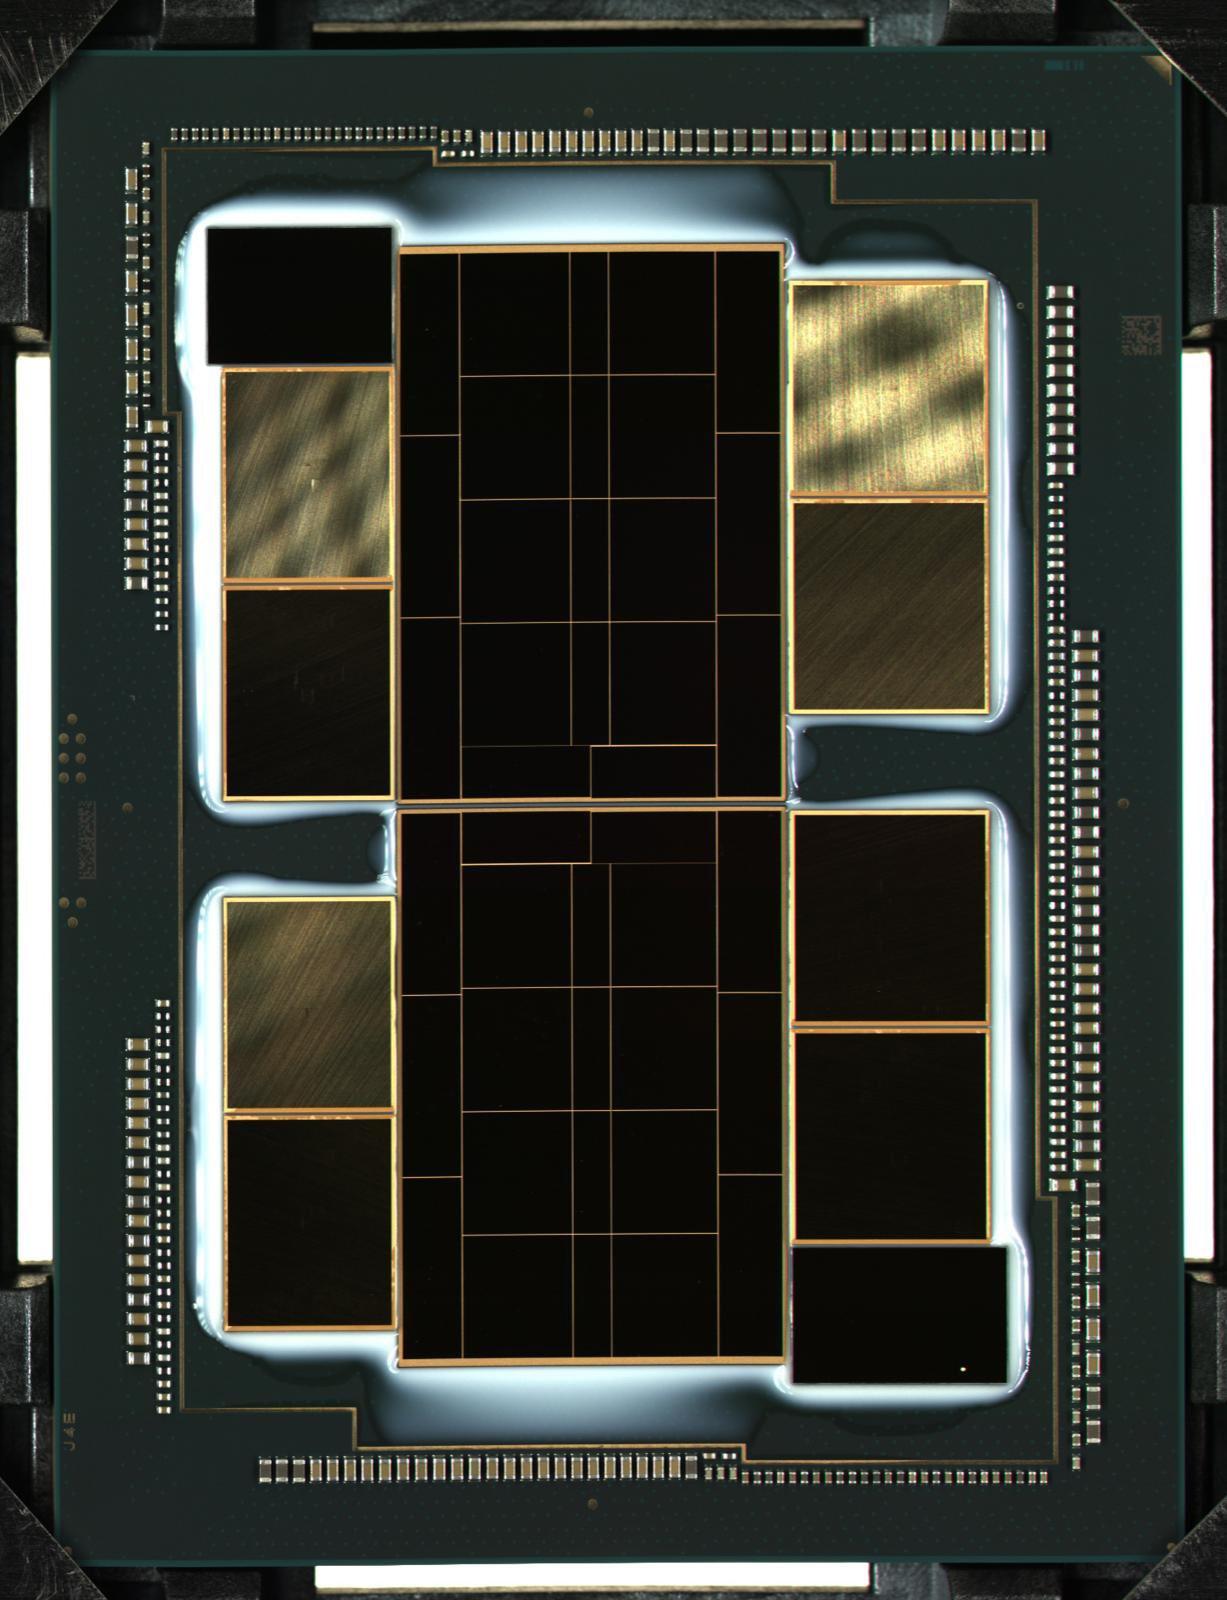 Раджа Кодури опубликовал фото графического процессора Xe-HPC